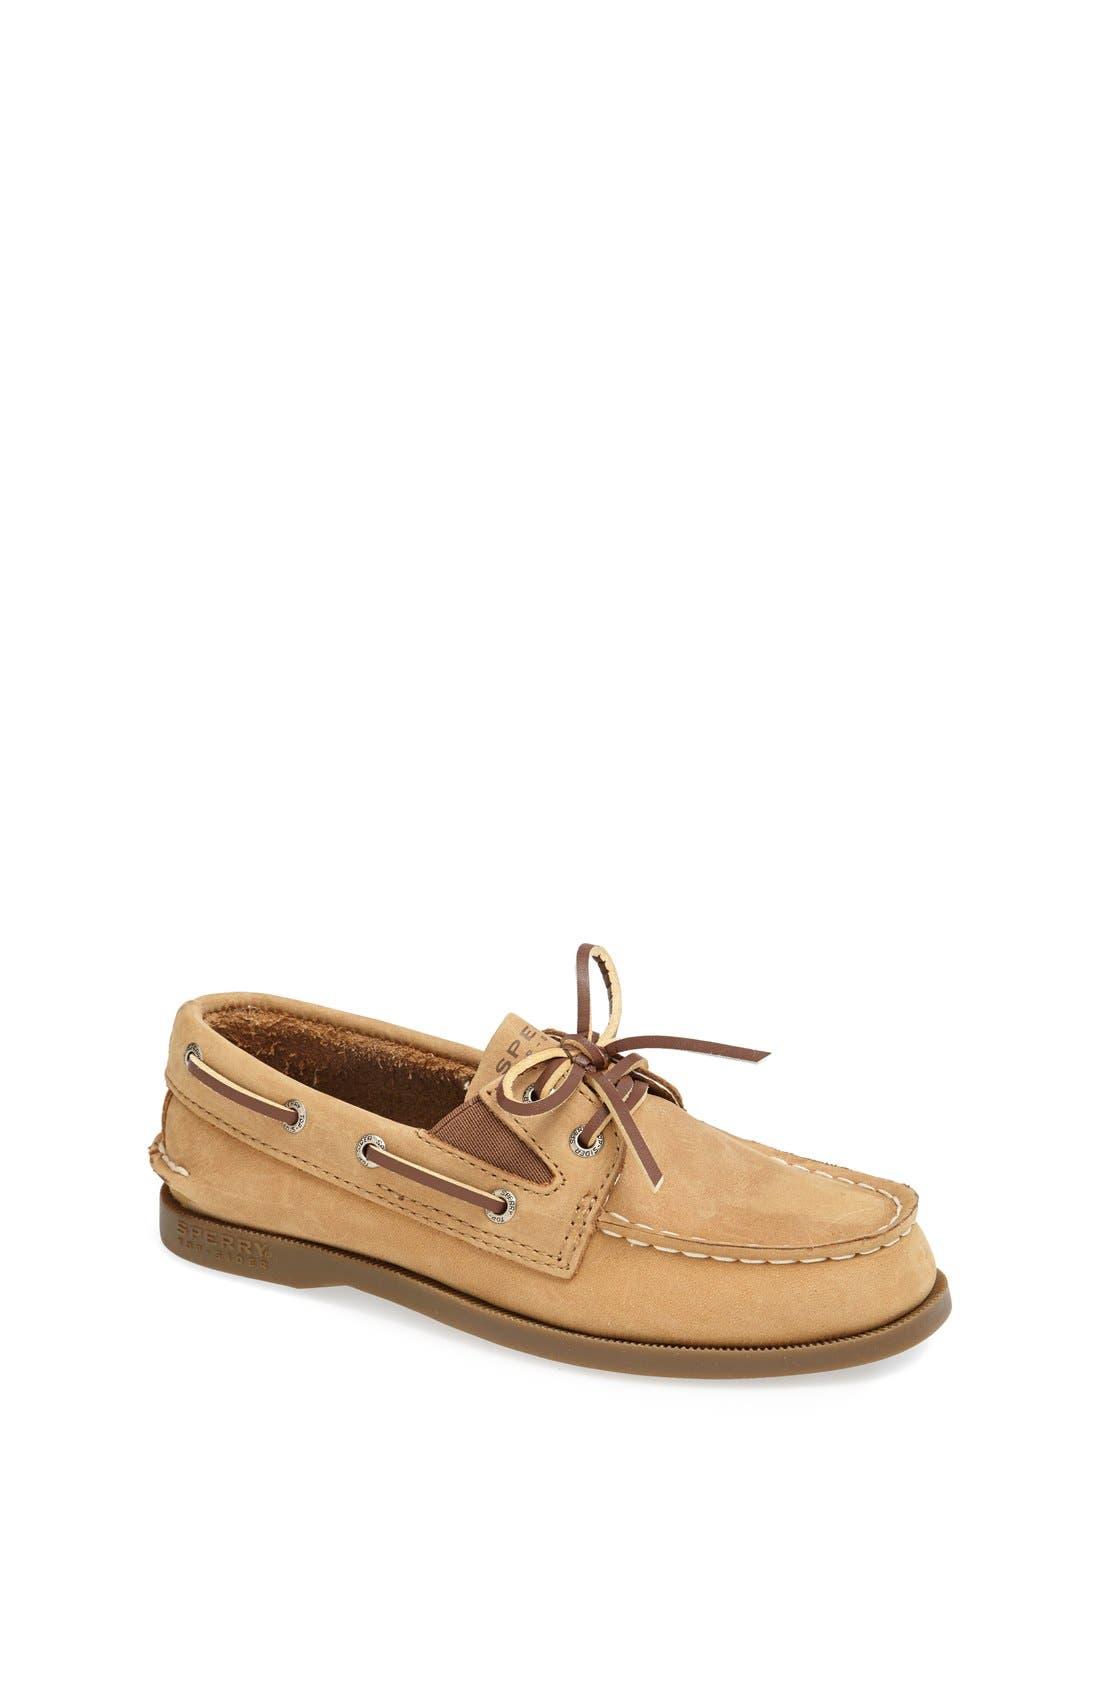 SPERRY KIDS Authentic Original Boat Shoe